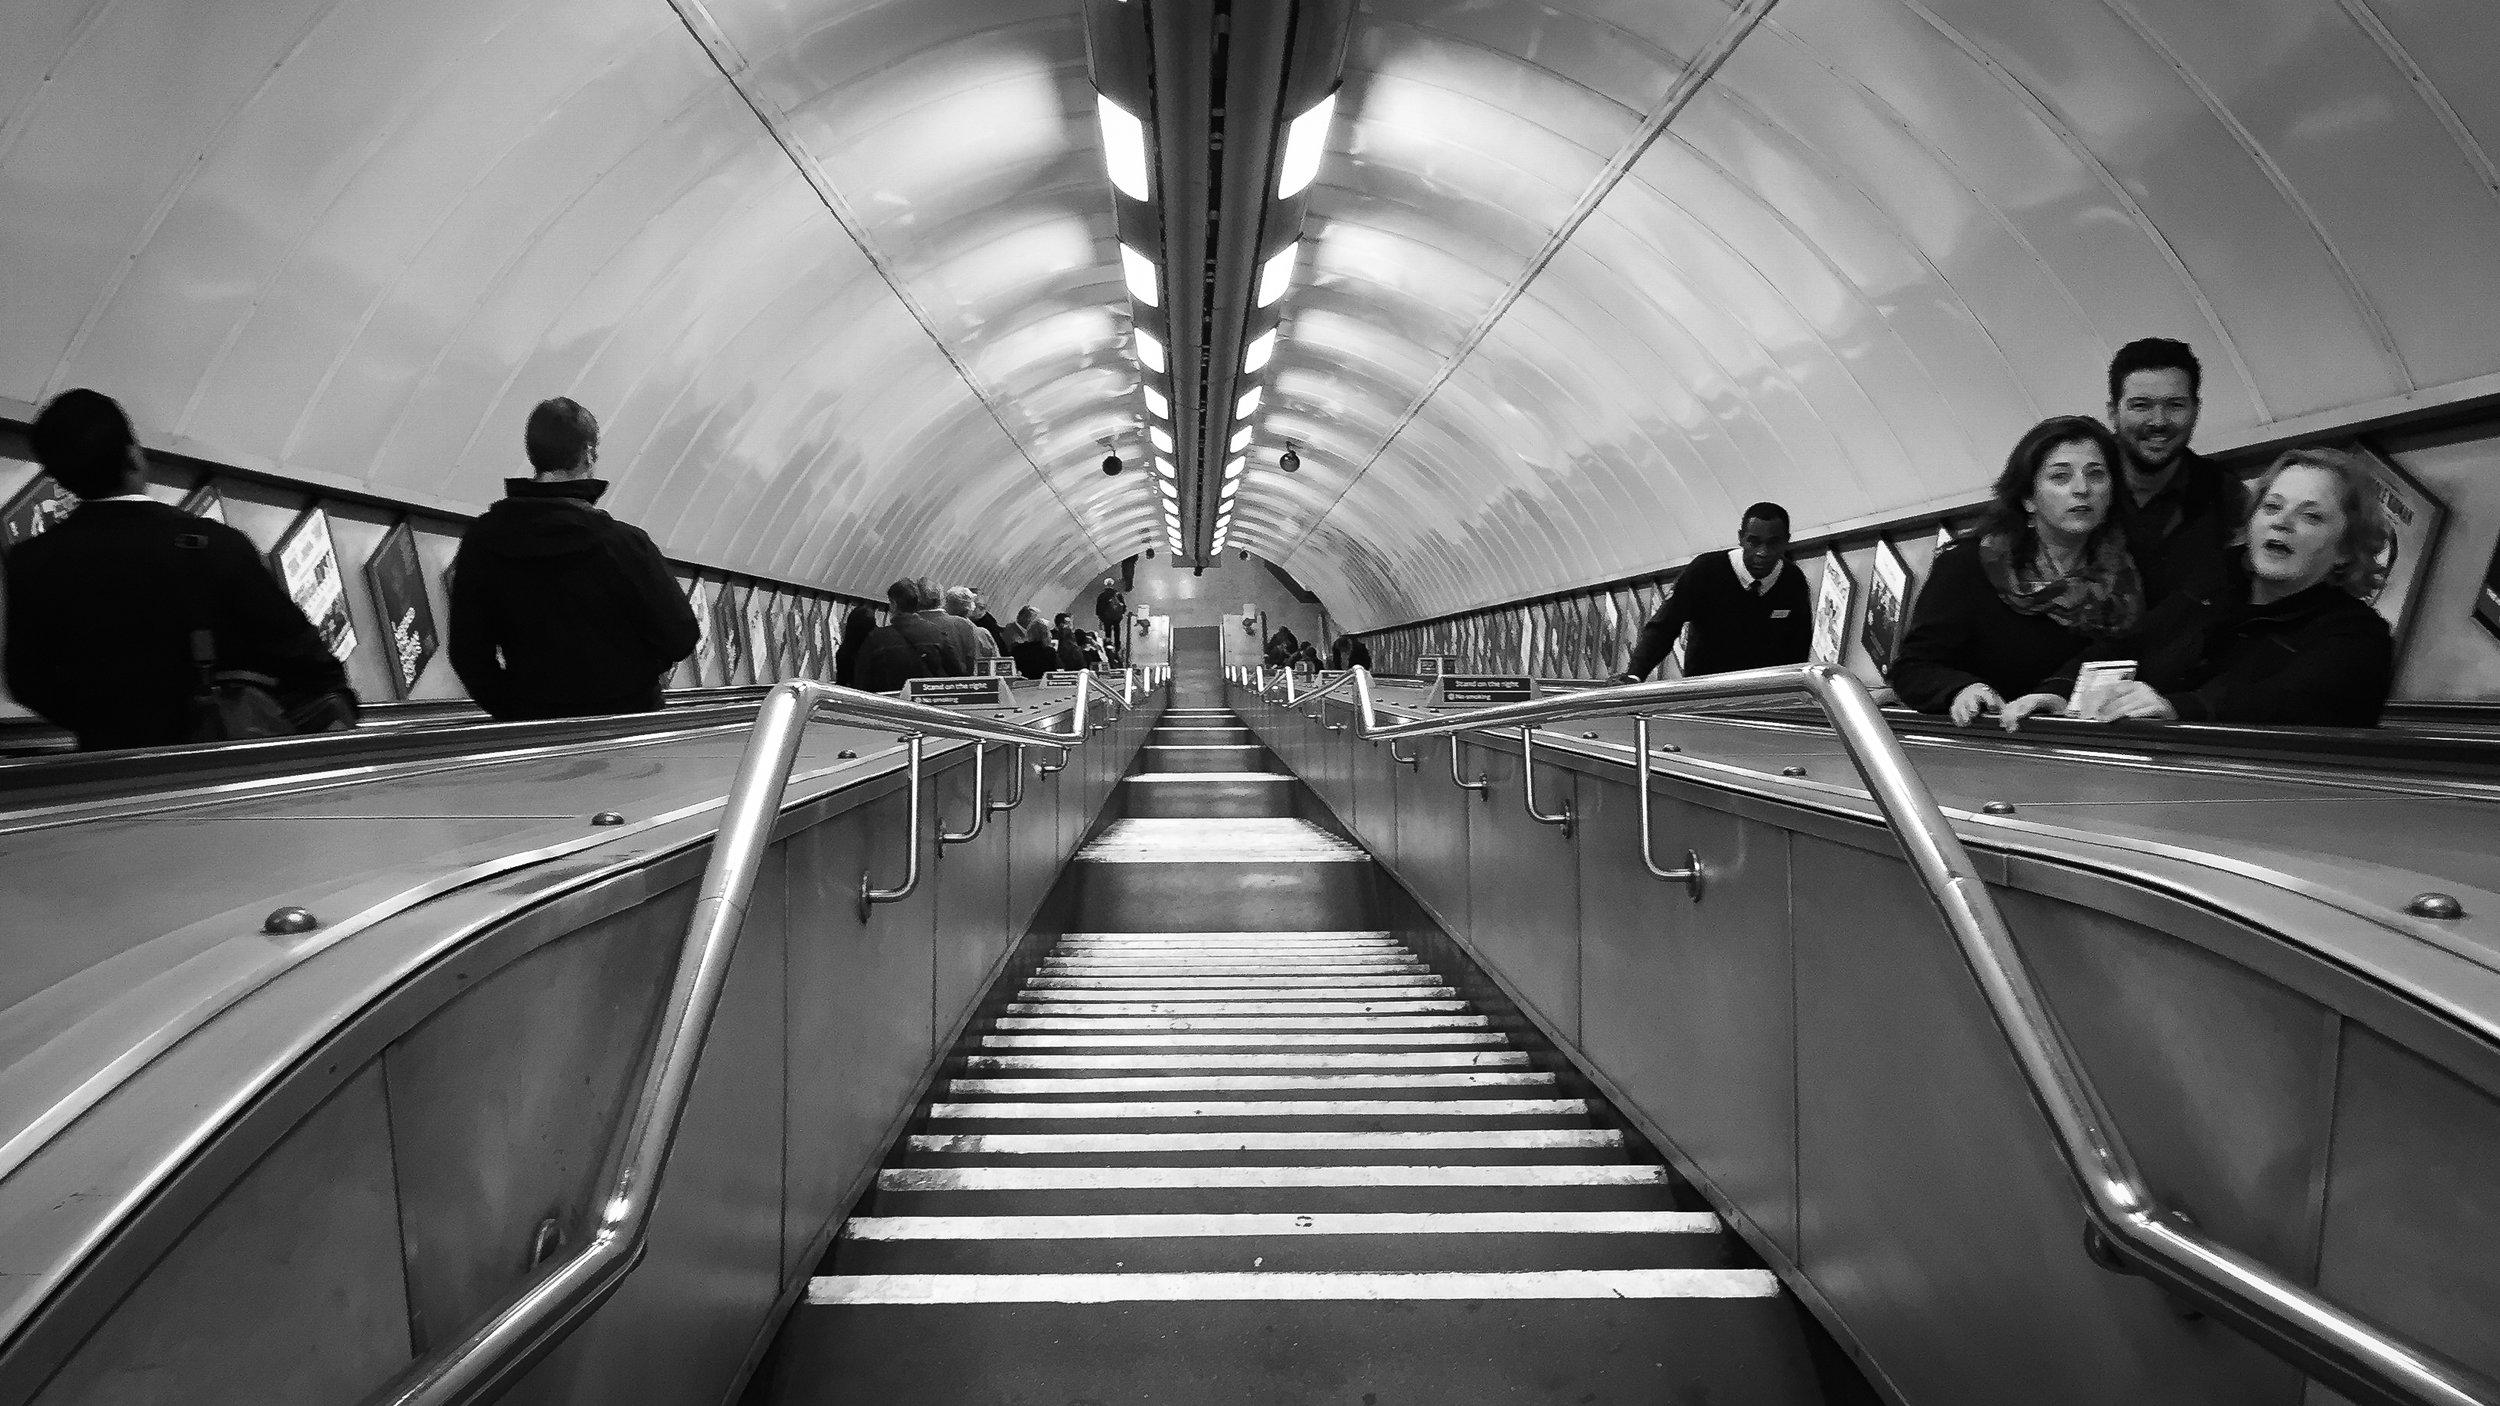 London, England / Londres, Angleterre